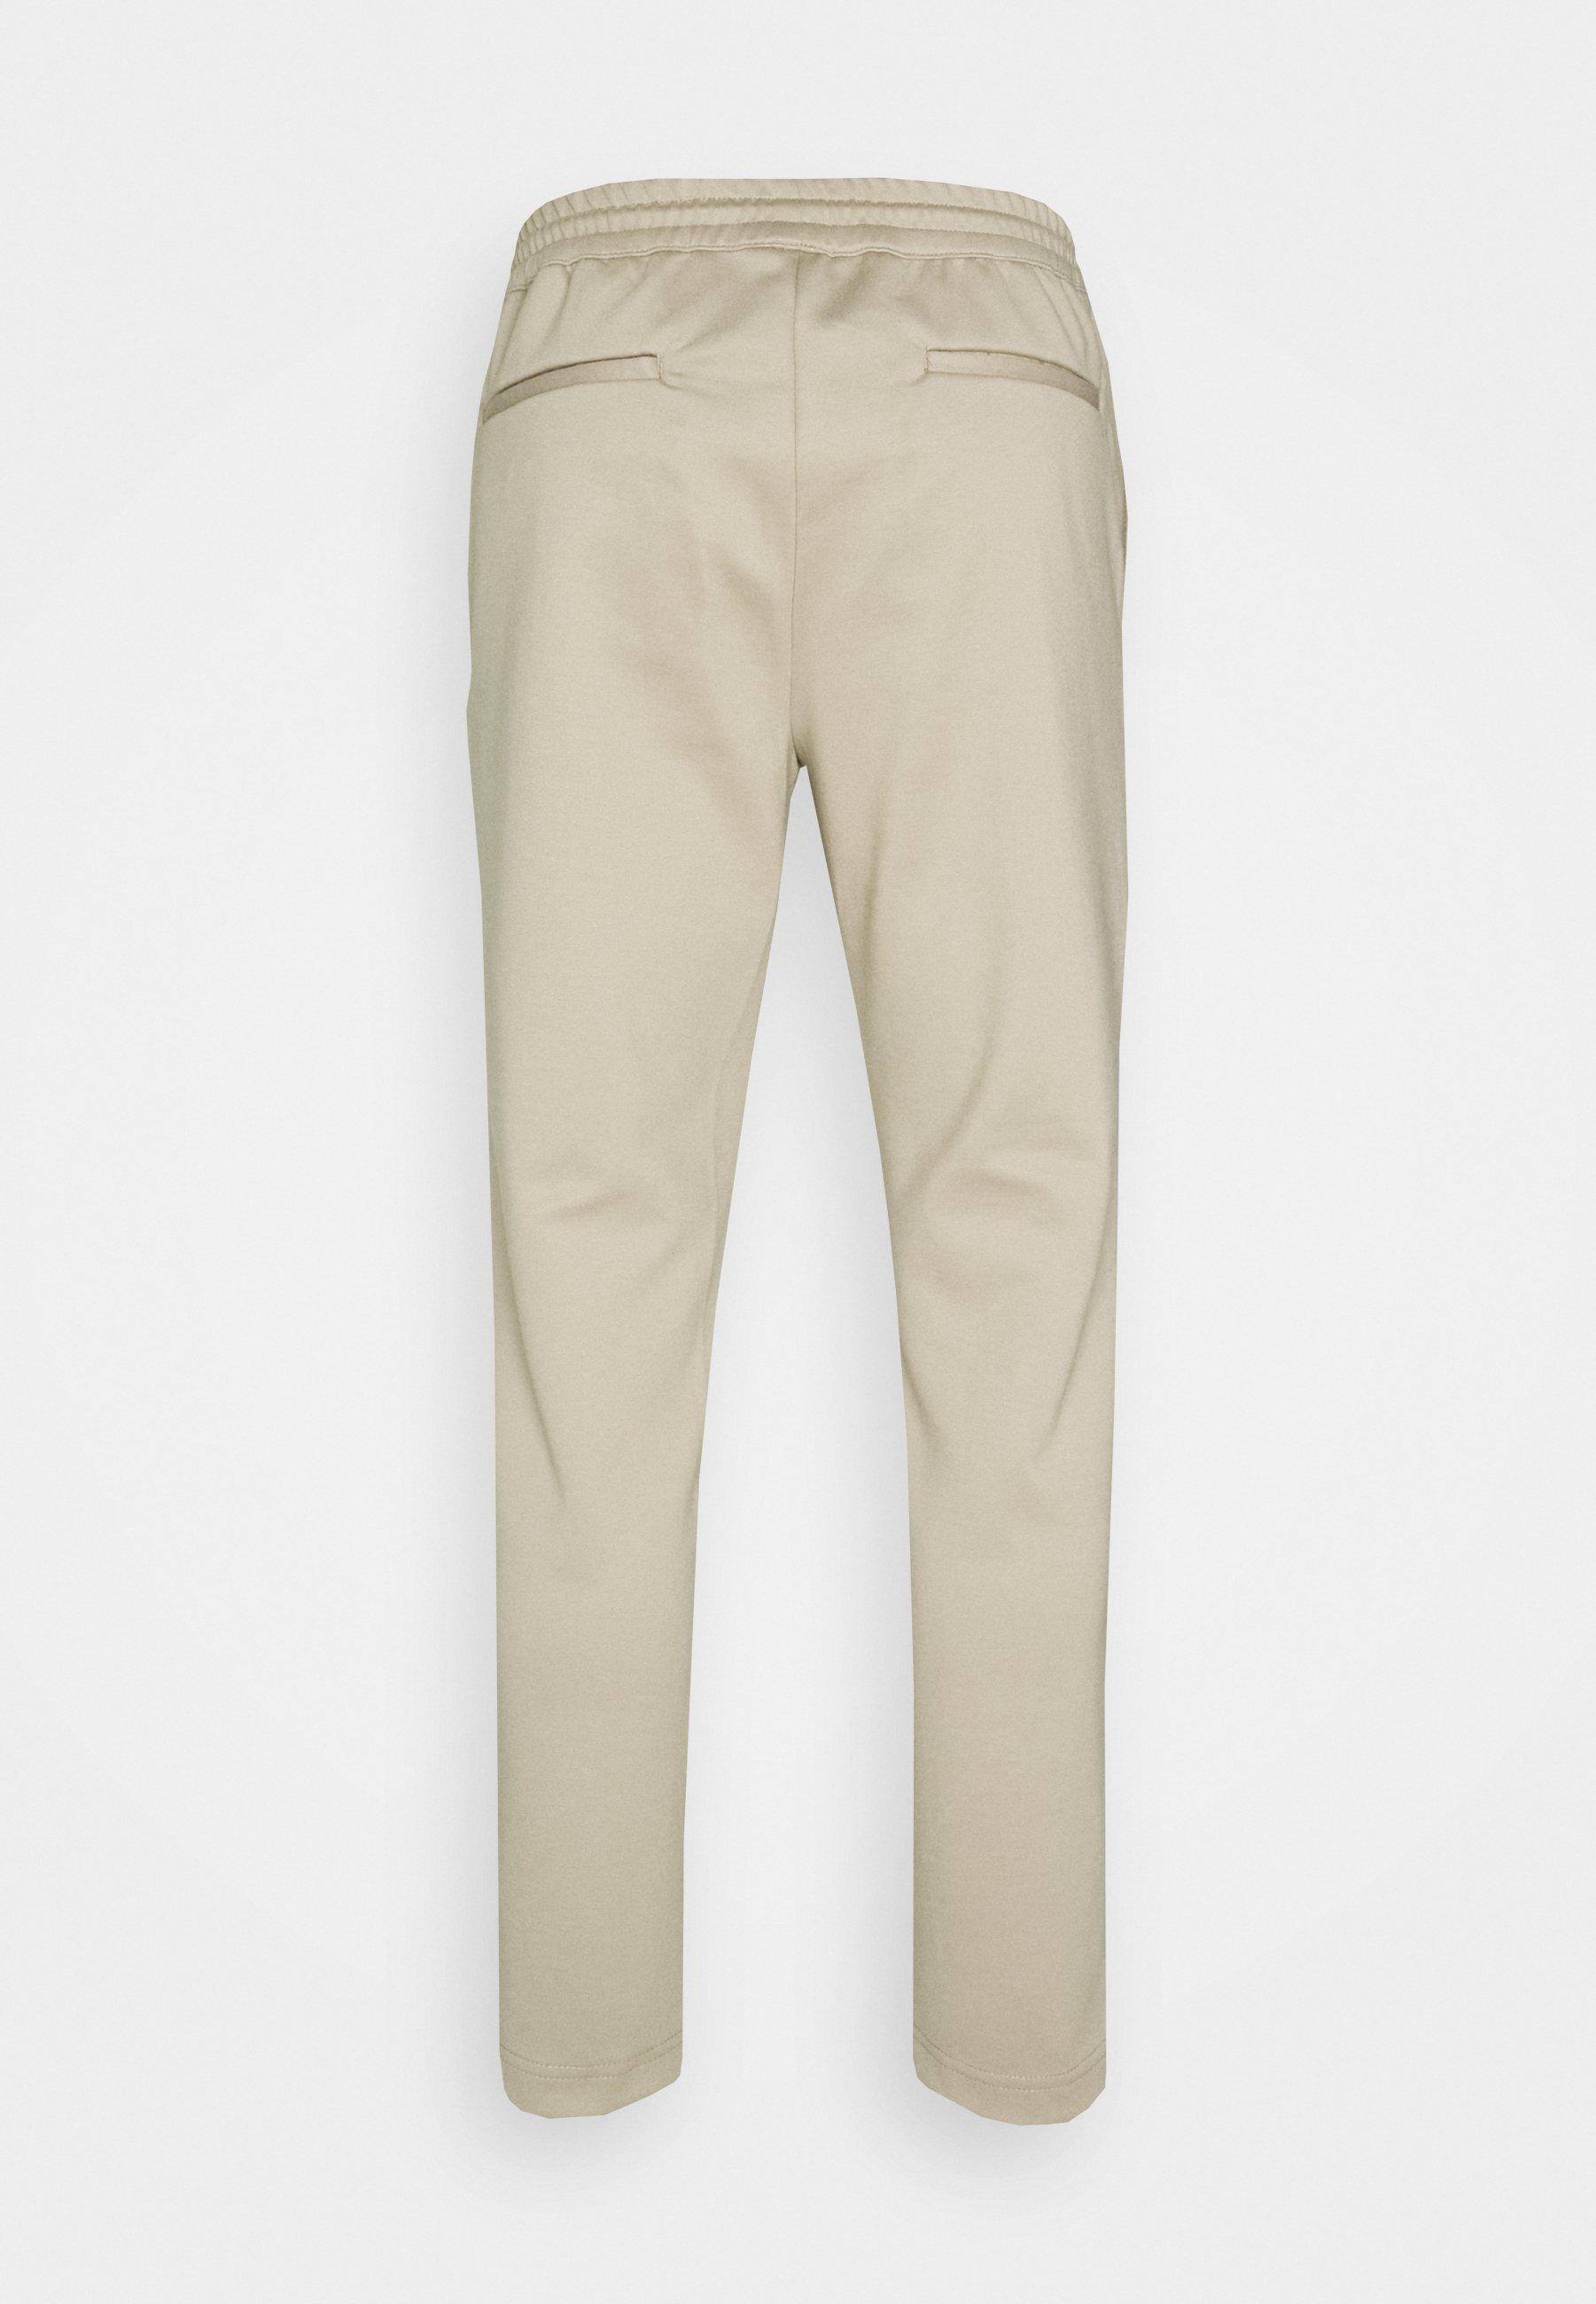 Homme JJIWILL JJPHIL NORCROCKERY - Pantalon de survêtement